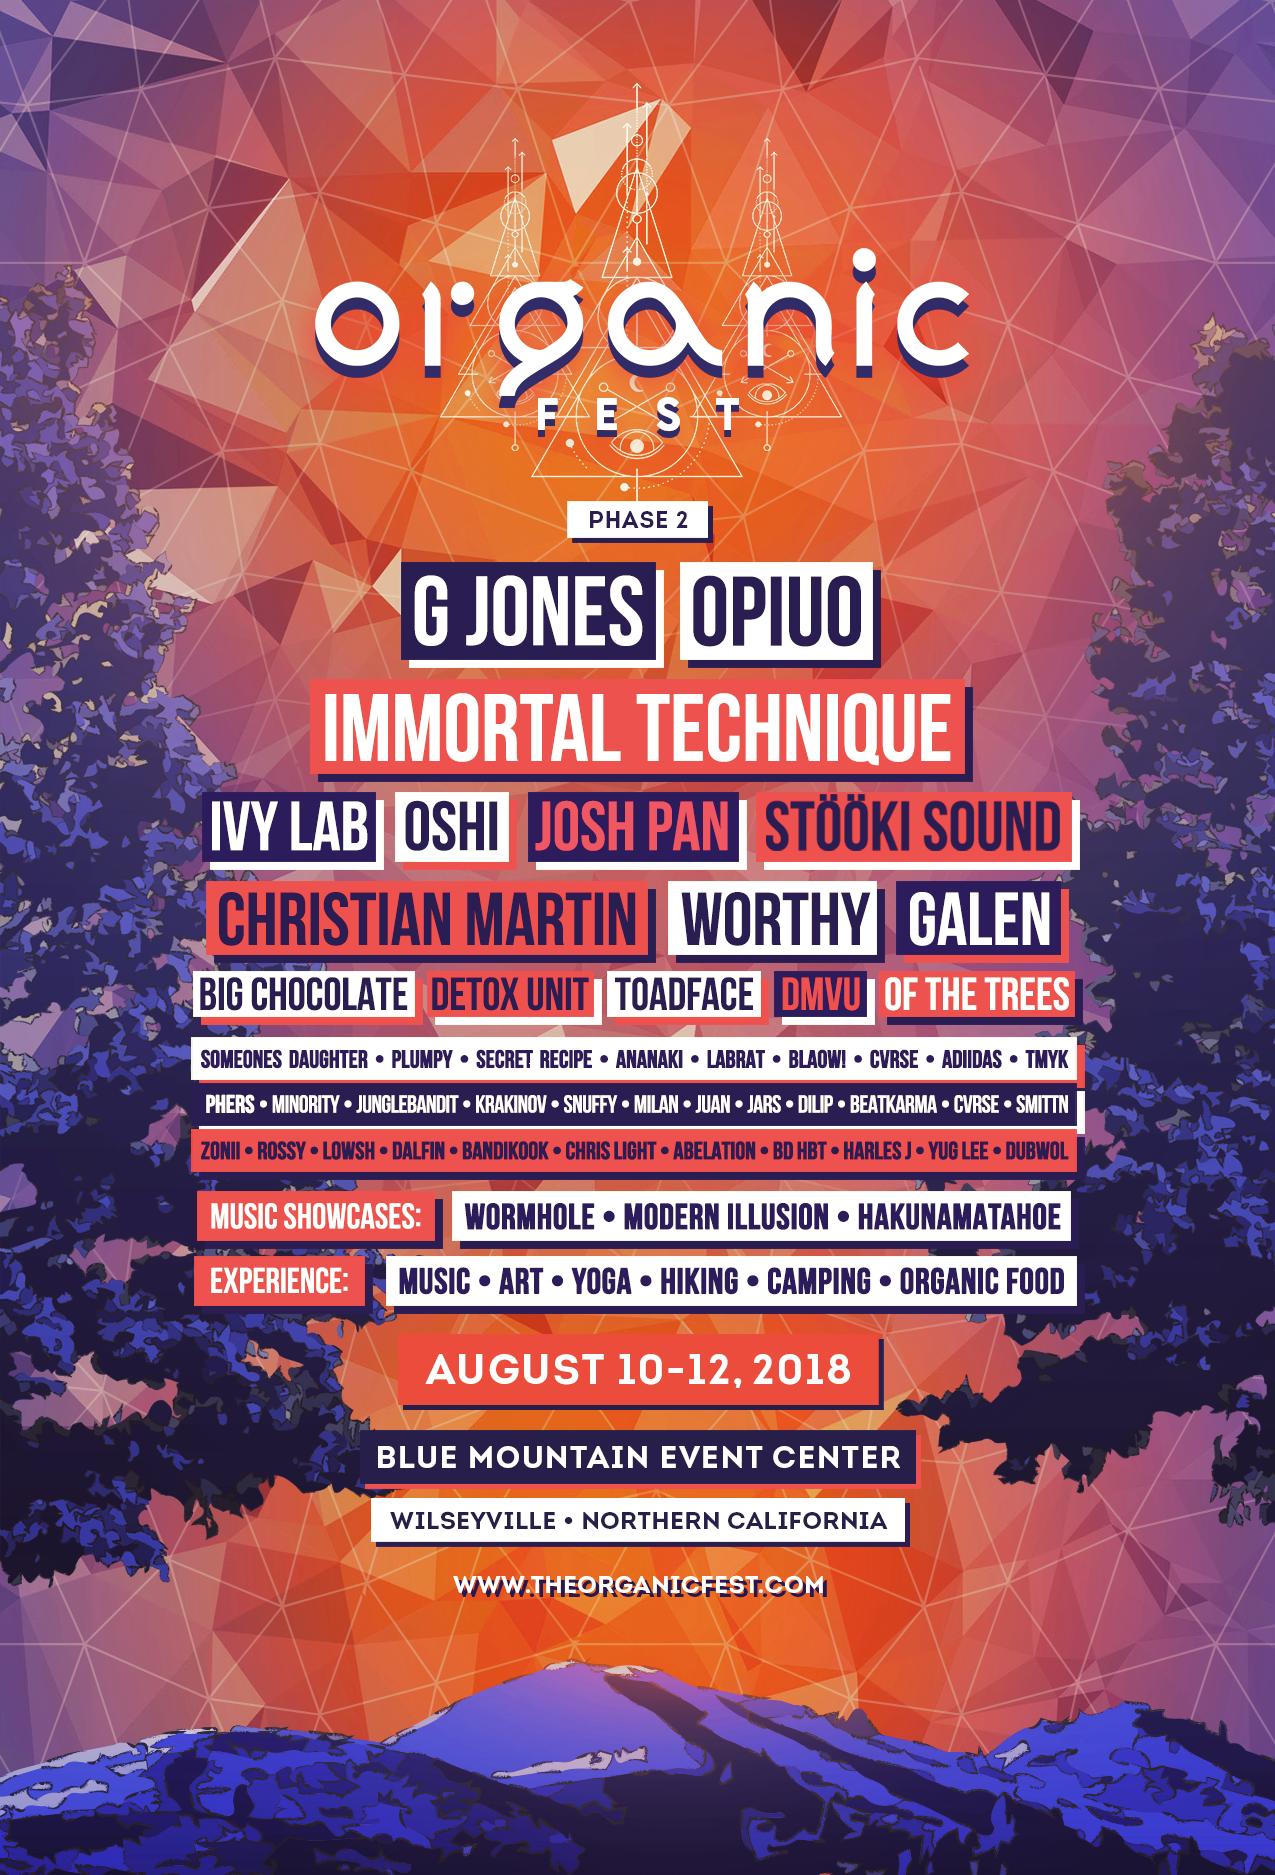 Organic Fest Adds G Jones As Its Final Headliner For 2018